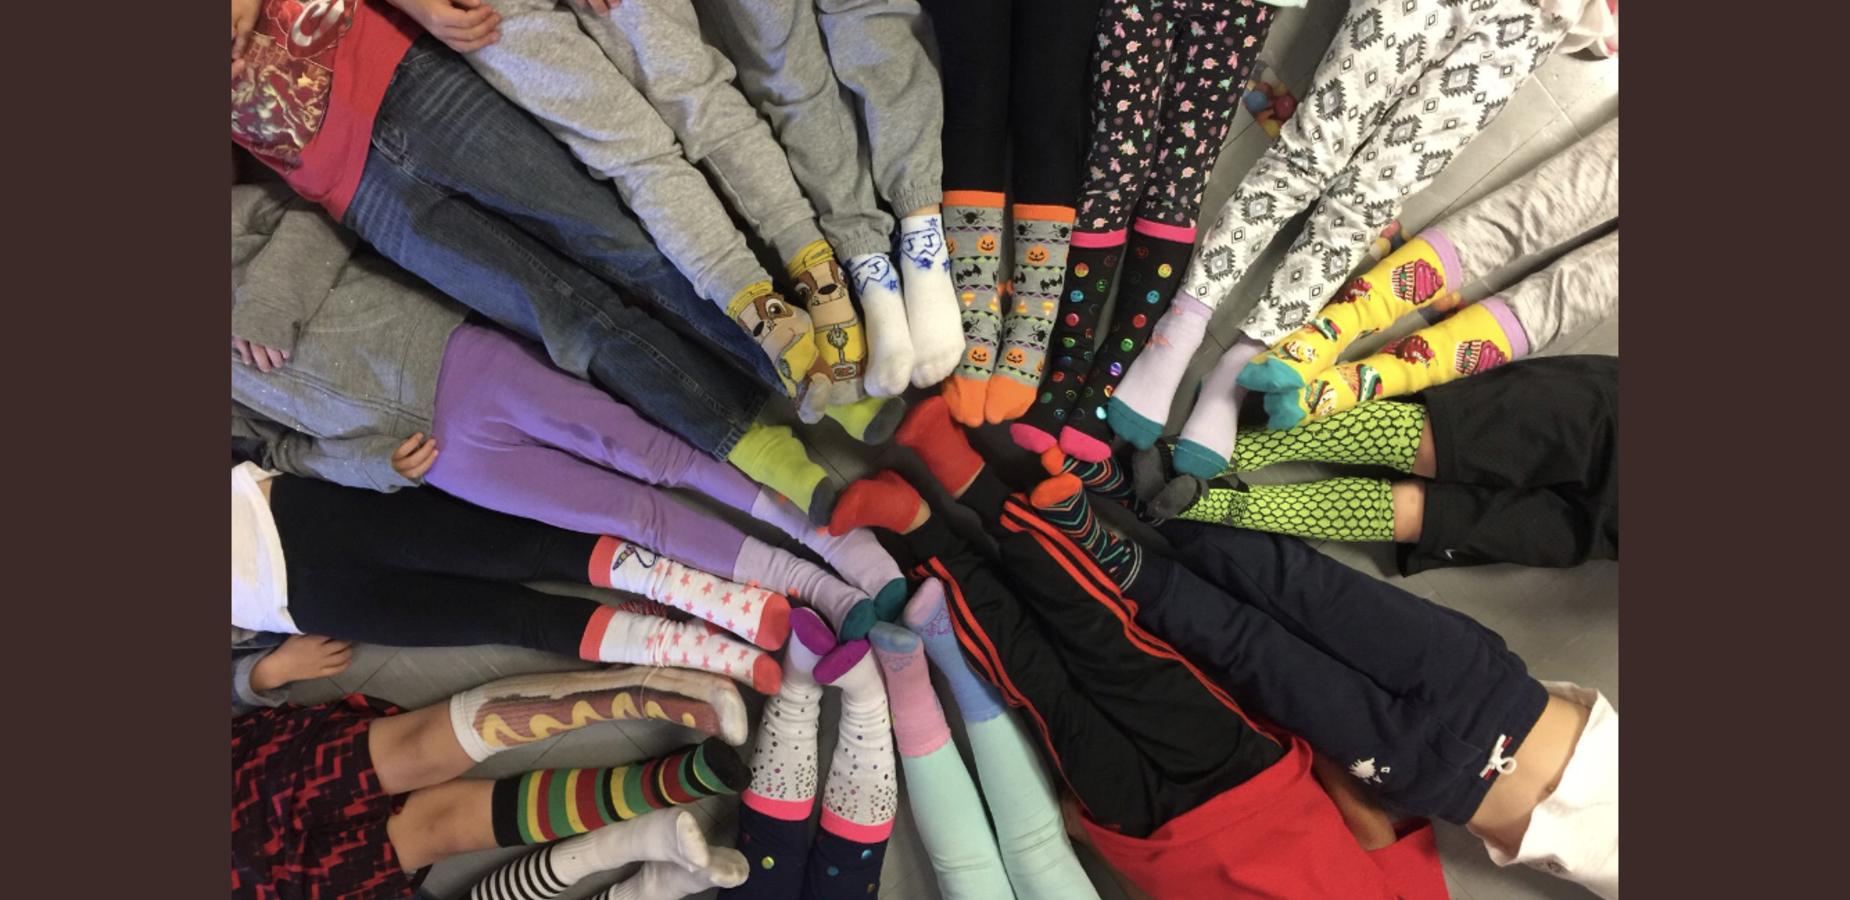 Students Socks